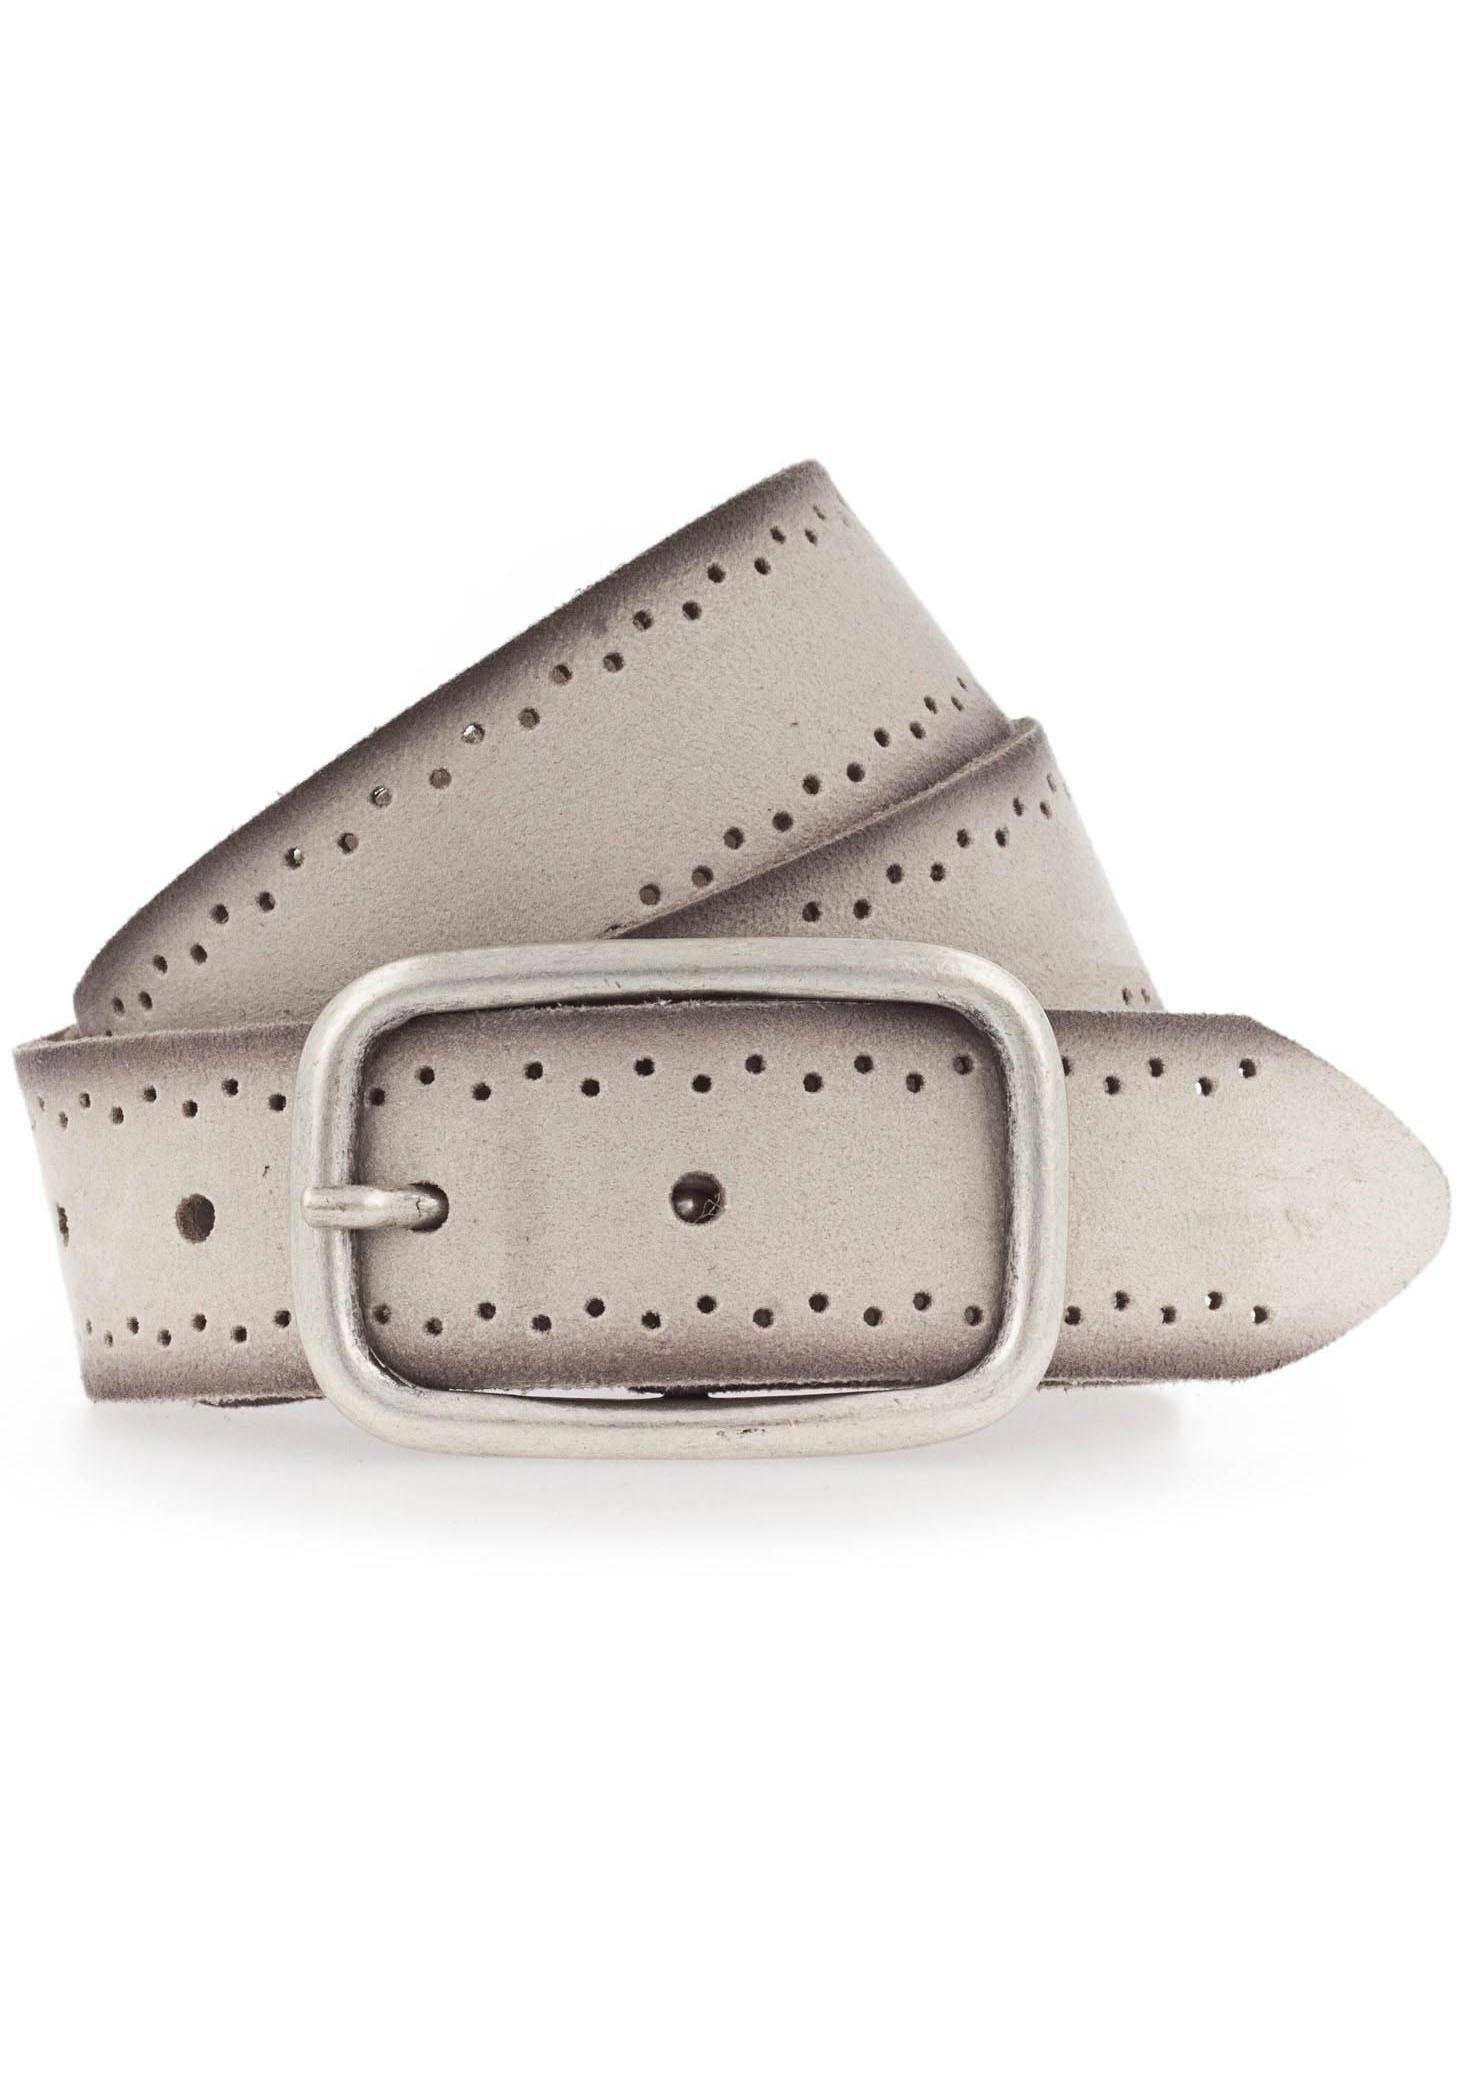 MUSTANG Ledergürtel, Robustes, genarbtes Rindsleder mit Lochstanzung beige Damen Ledergürtel Gürtel Accessoires